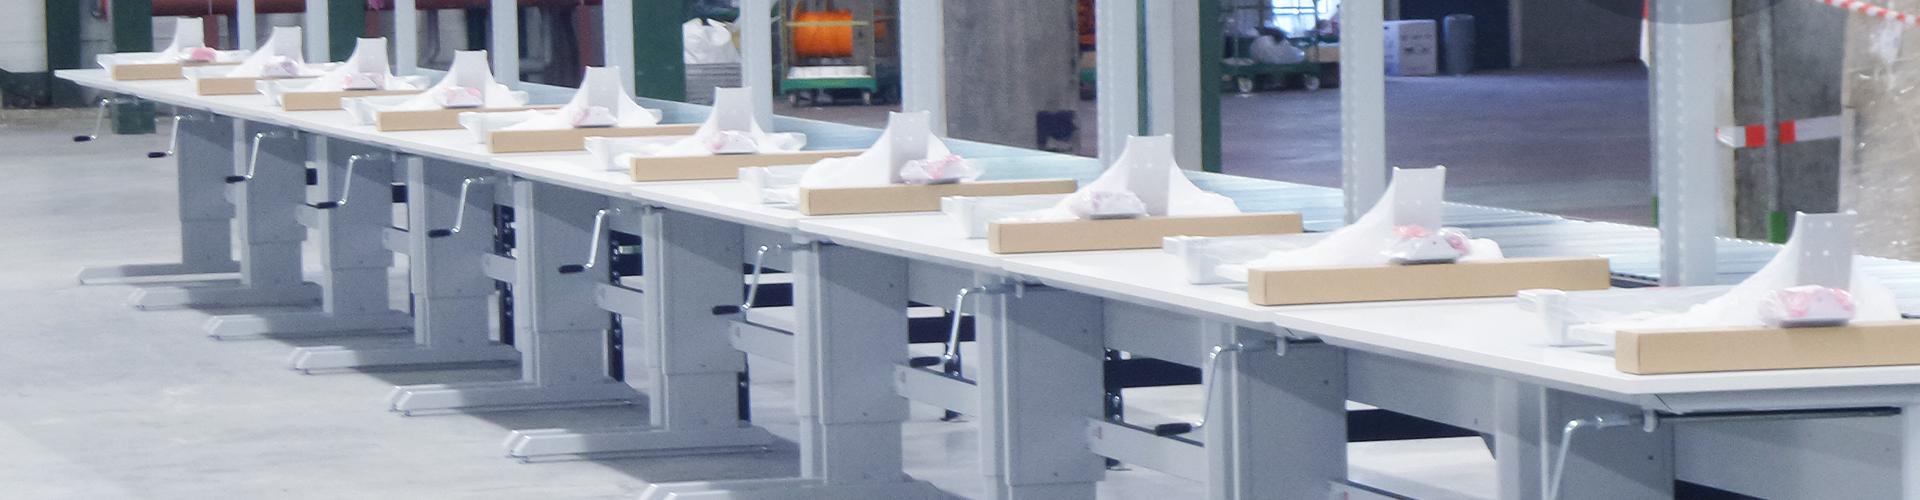 Sovella Nederland Treston logistieke werkplek voor webshops en ecommerce - logistieke werkplek - magazijn werktafel